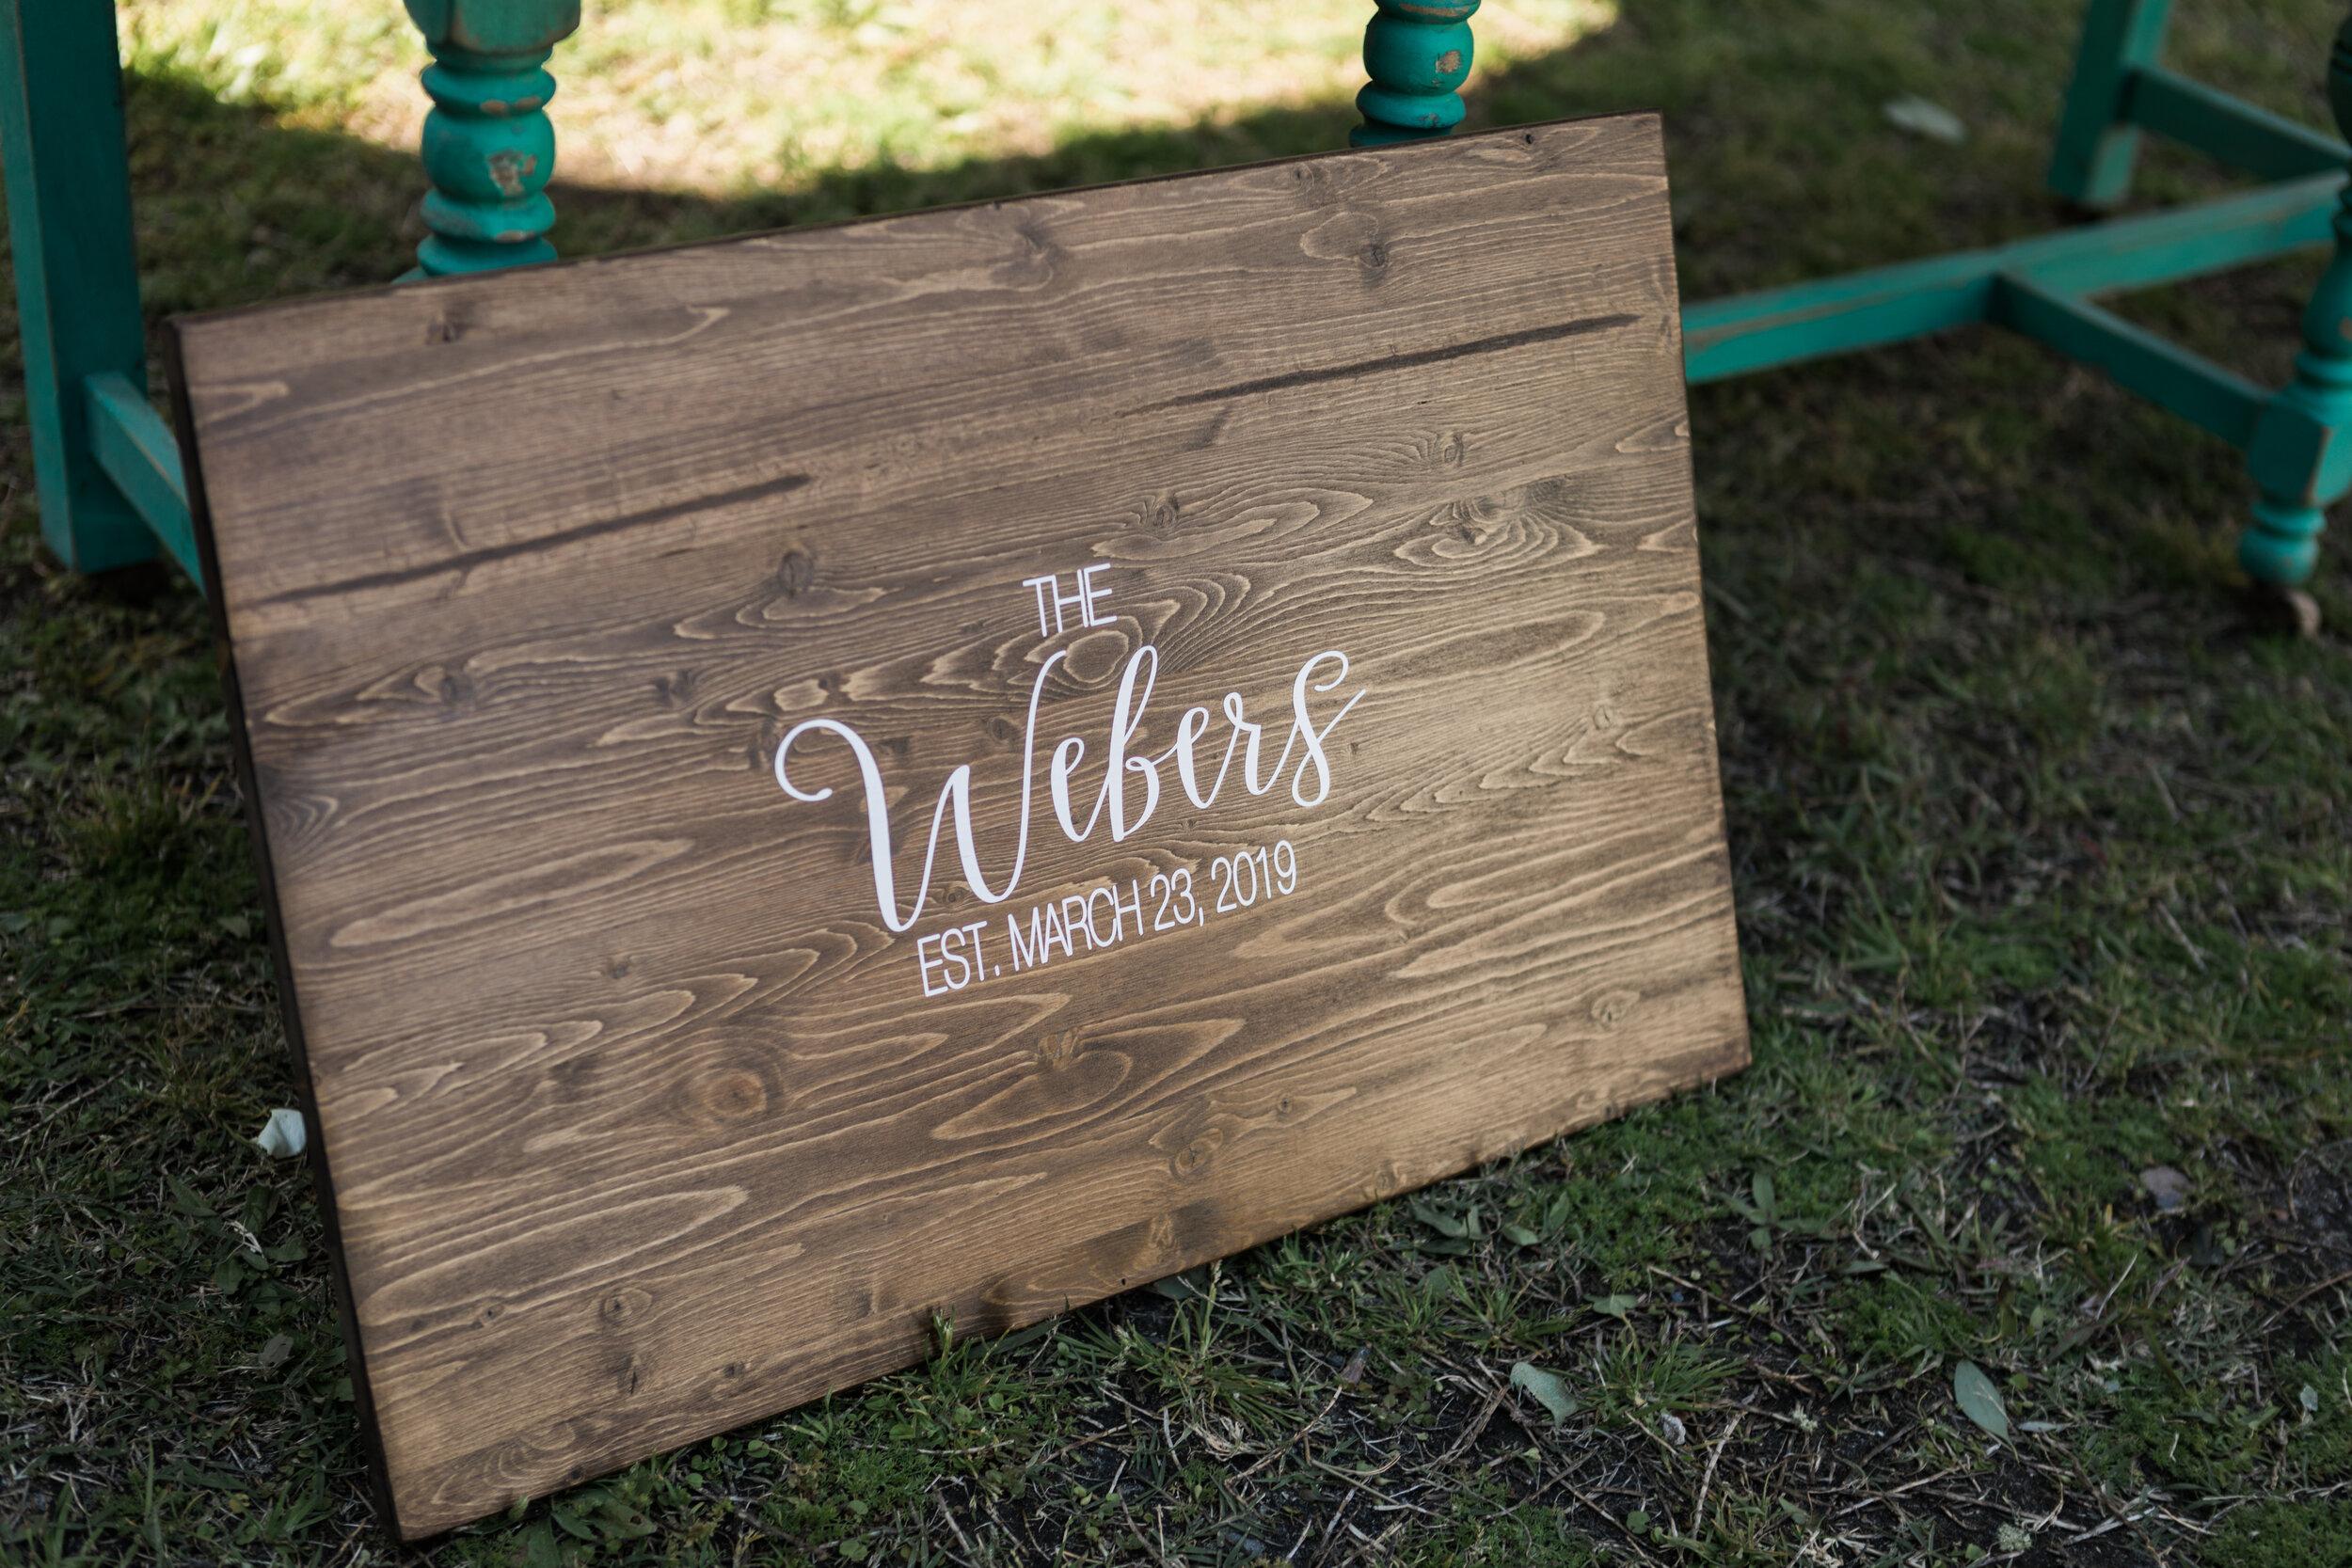 ivory-and-beau-blog-weddings-ivory-and-beau-couple-dominique-and-andres-savannah-florist-wedding-planning-savannah-bridal-boutique-wedding-flowers-KIP_WEBERWEDDING_RAILROADMUSEUM-1117.JPG